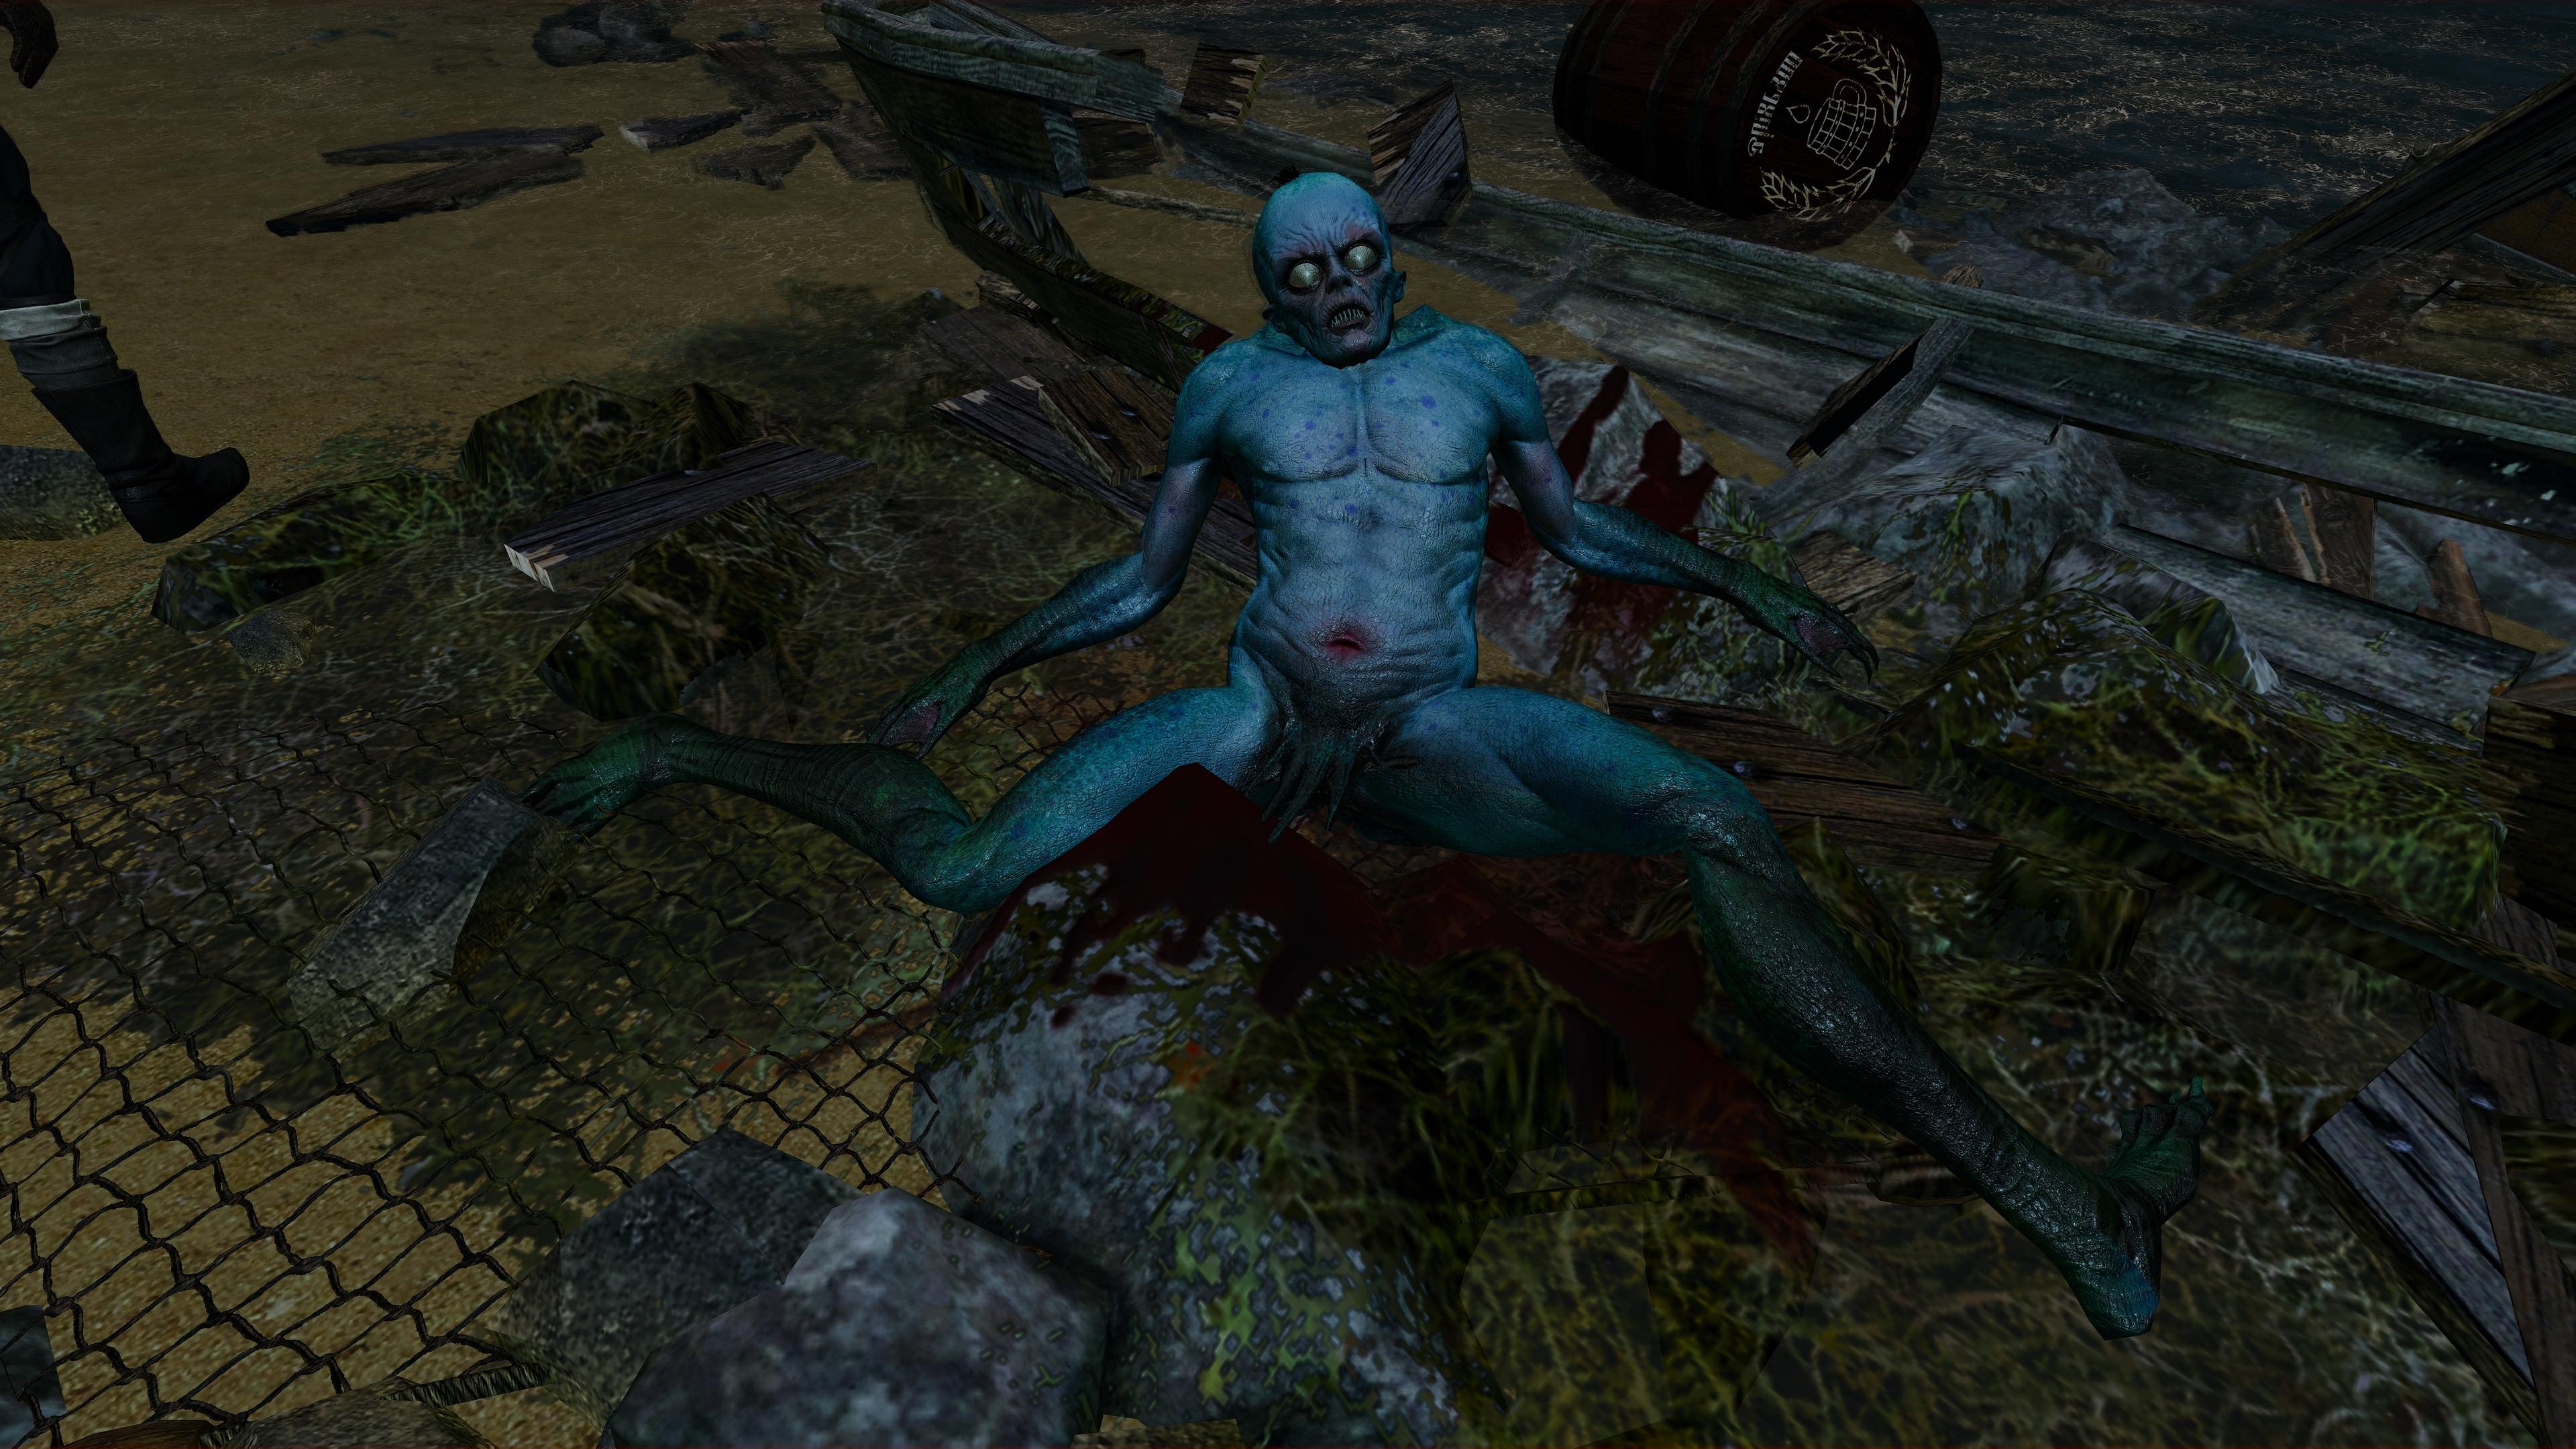 The Witcher 3 Screenshot 2020.07.20 - 20.31.51.49.jpg - The Witcher 3: Wild Hunt